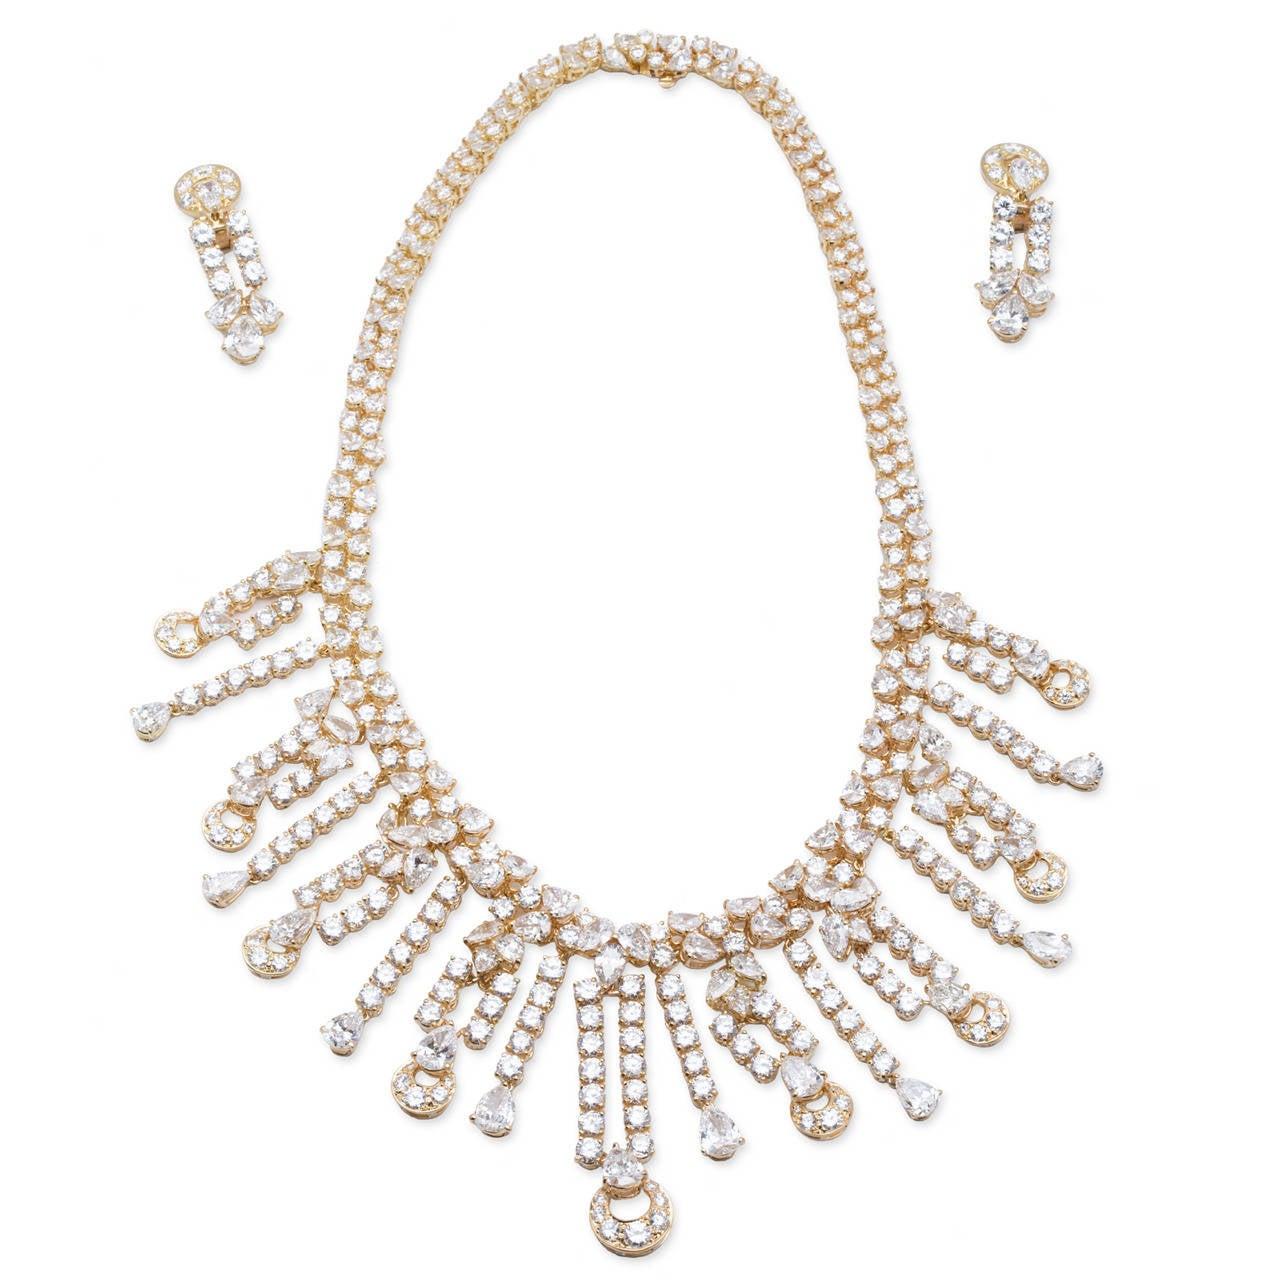 Bulgari Diamond Necklace Earring Set